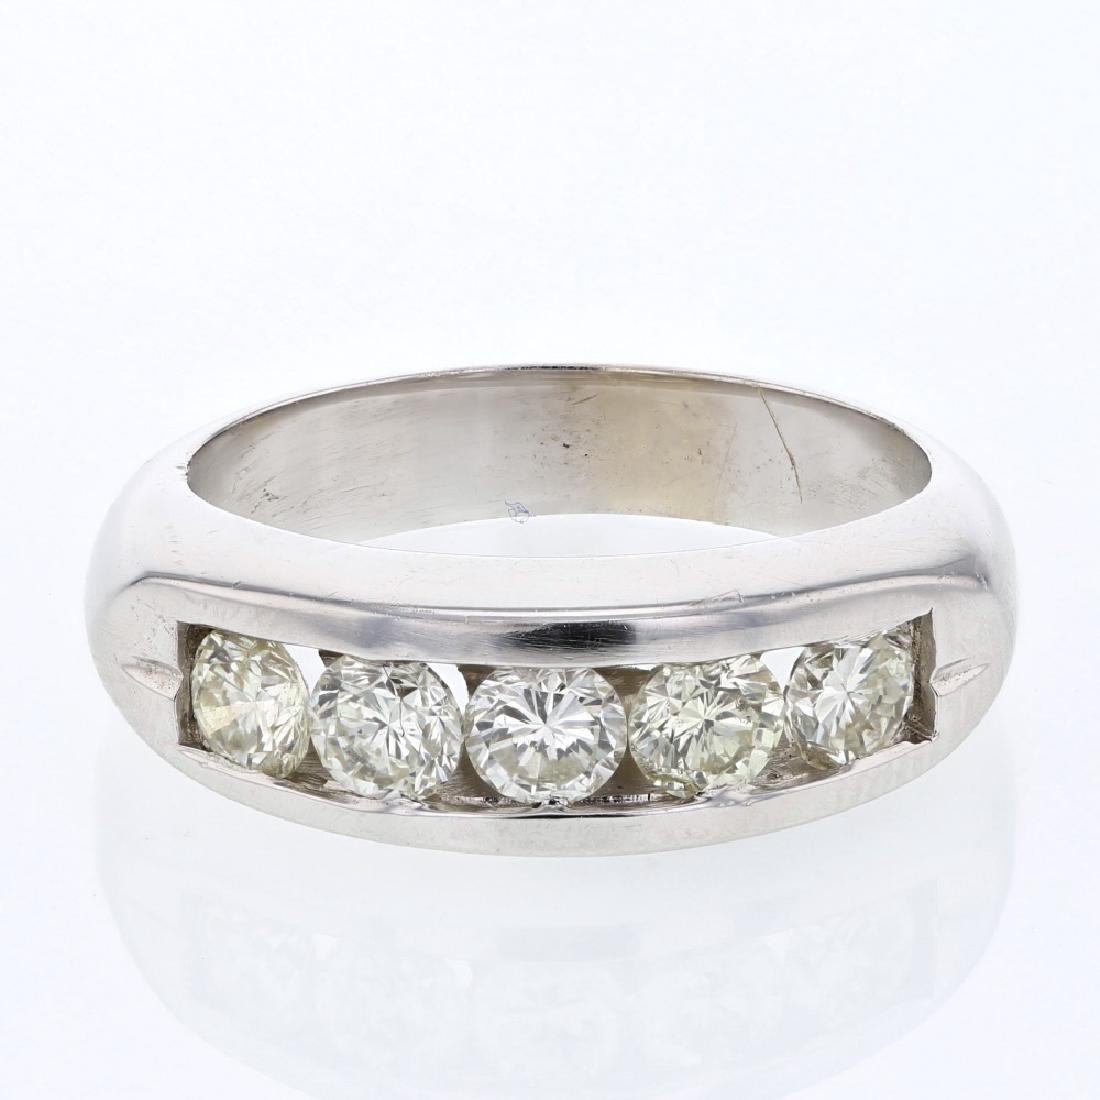 1.28 CTW Diamond Fashion  Ring in 14K White Gold